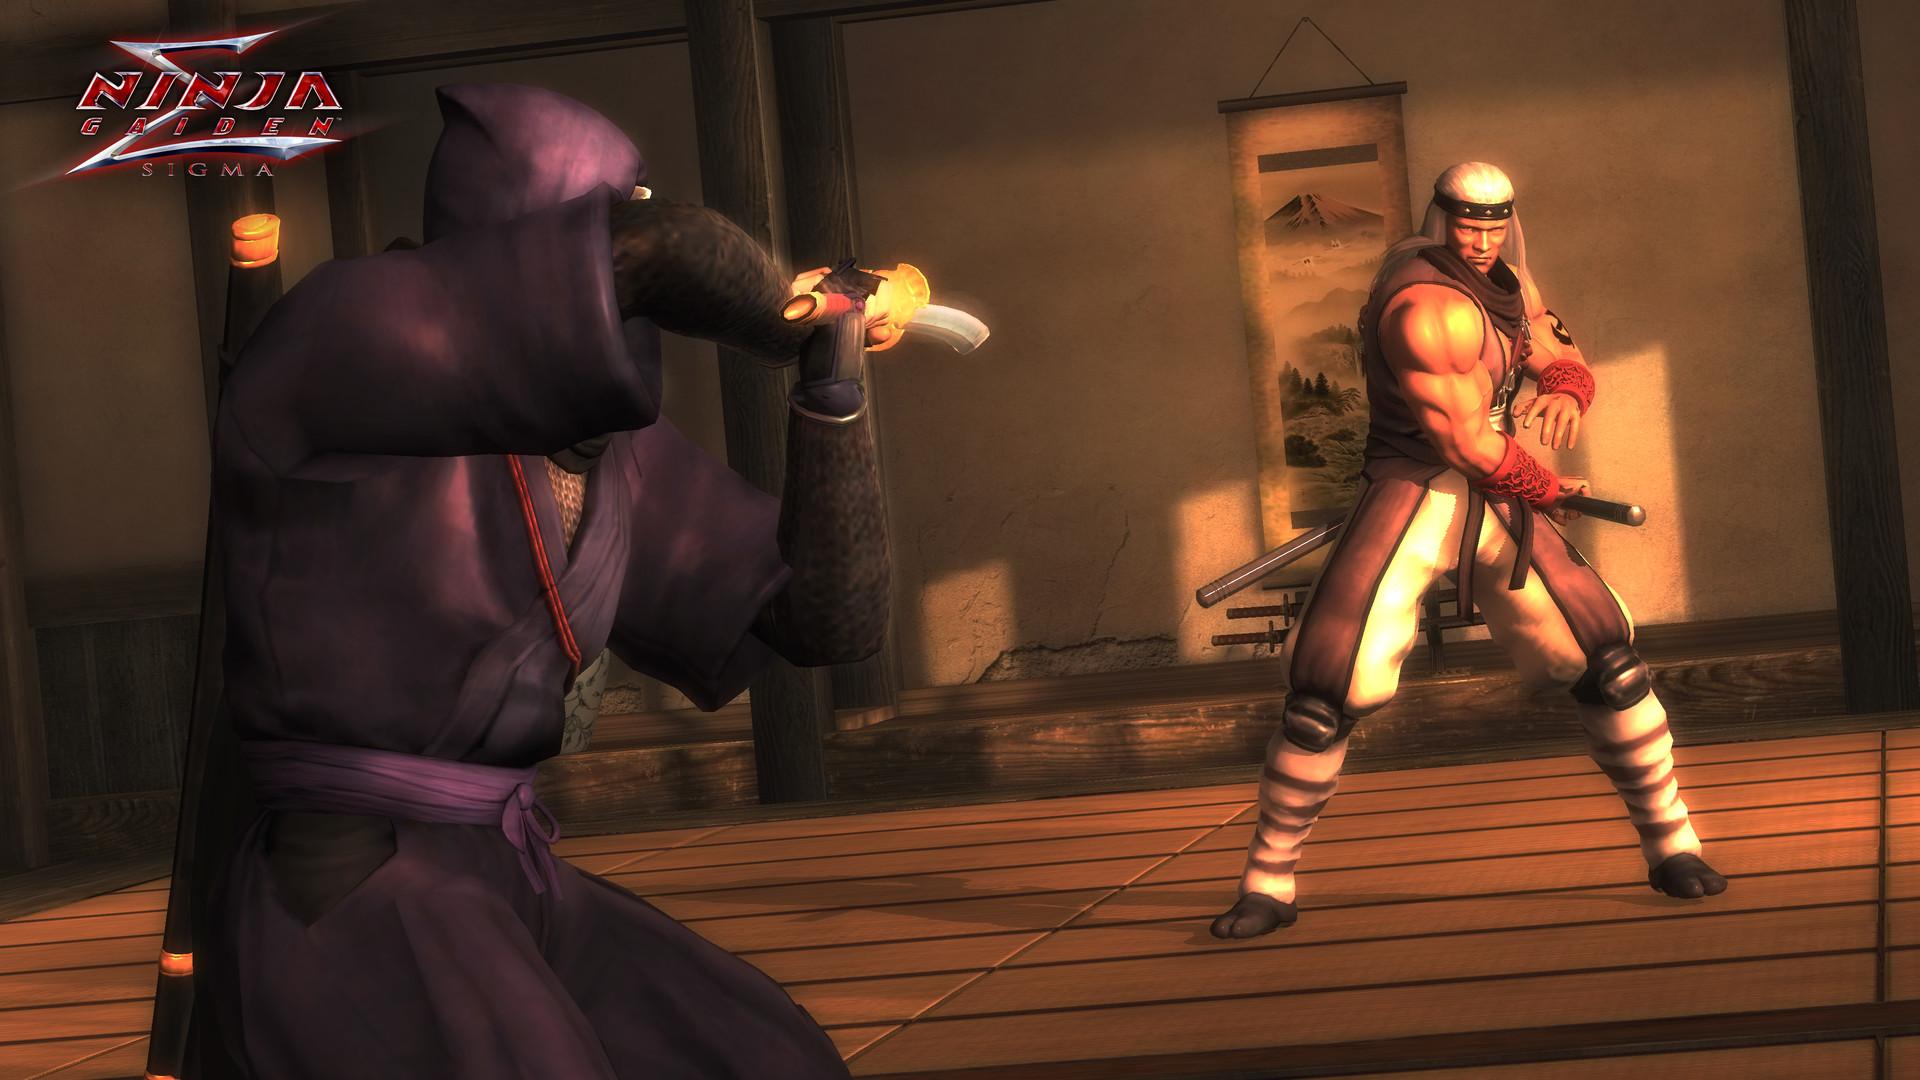 ninja-gaiden-sigma-pc-screenshot-1